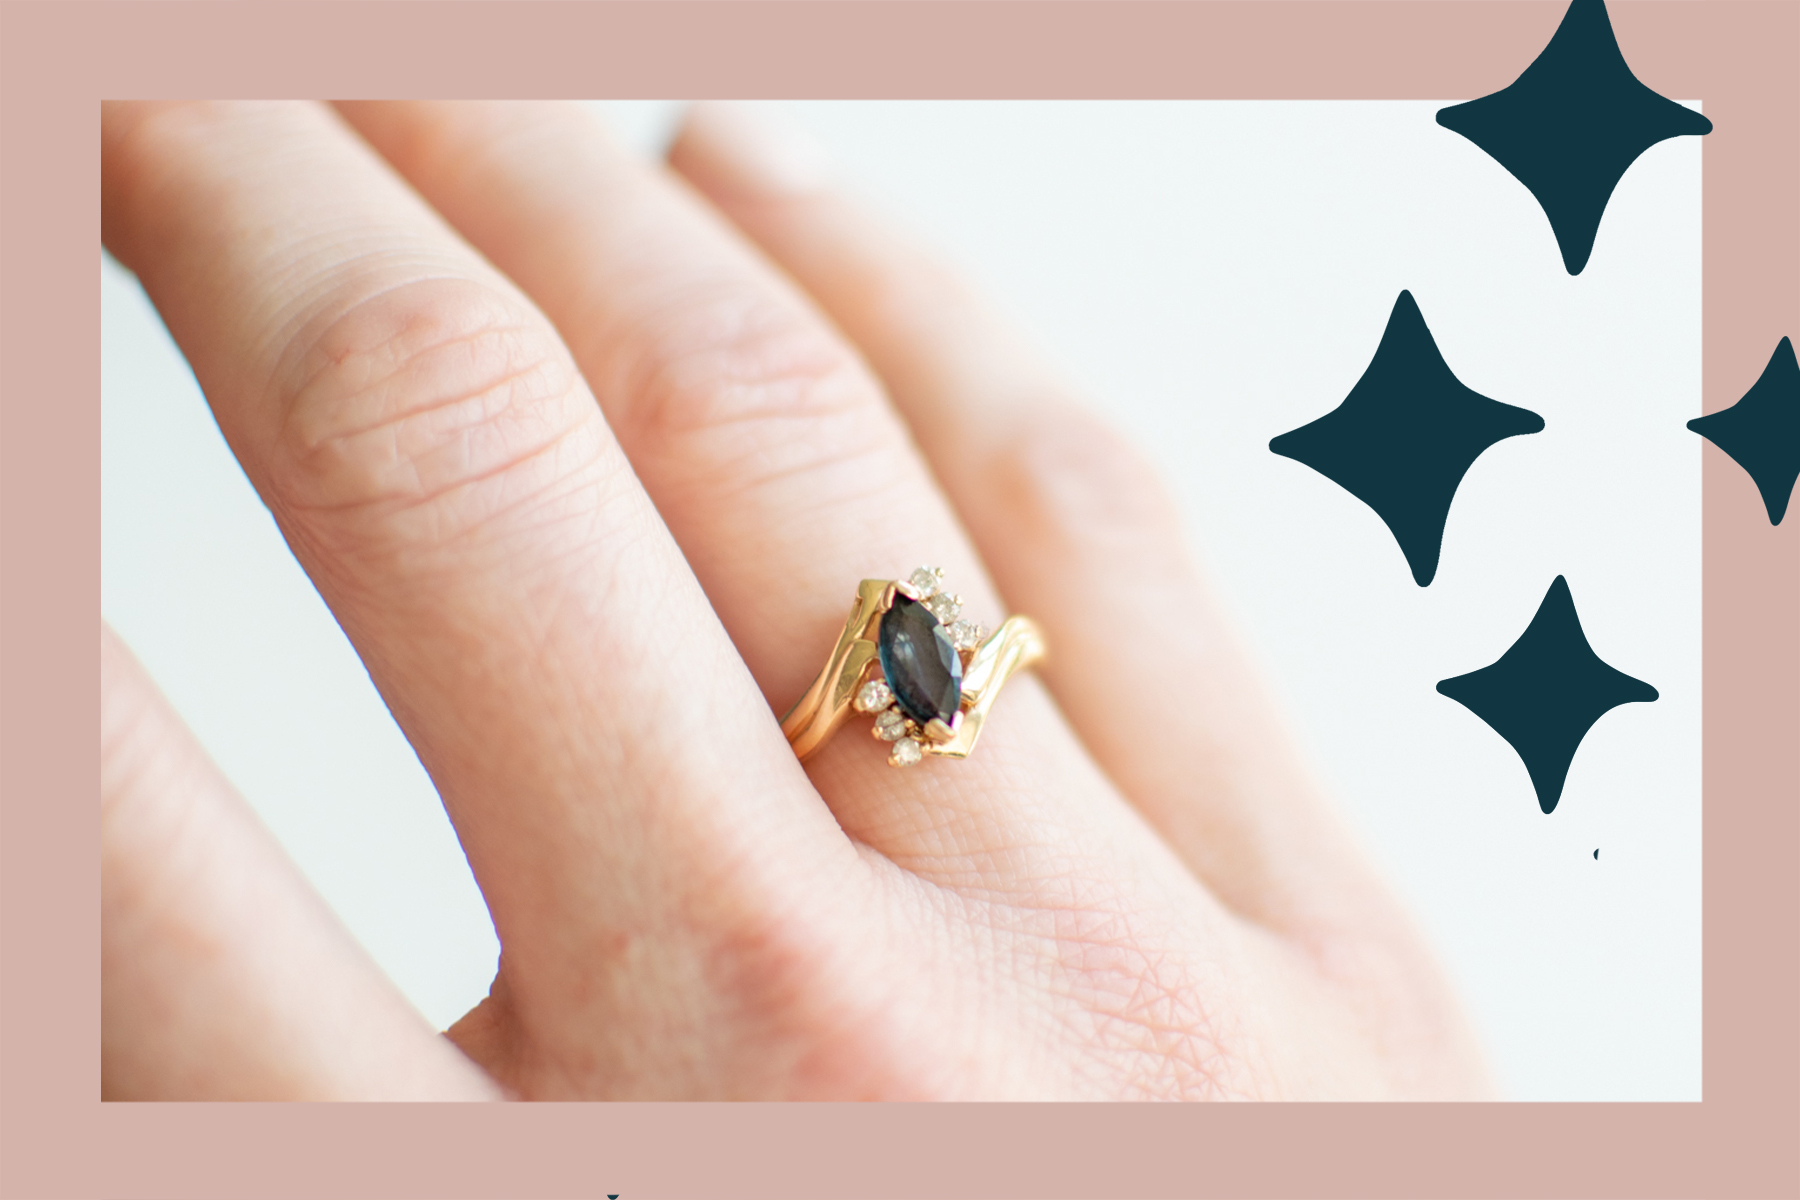 Single Woman Engagement Ring